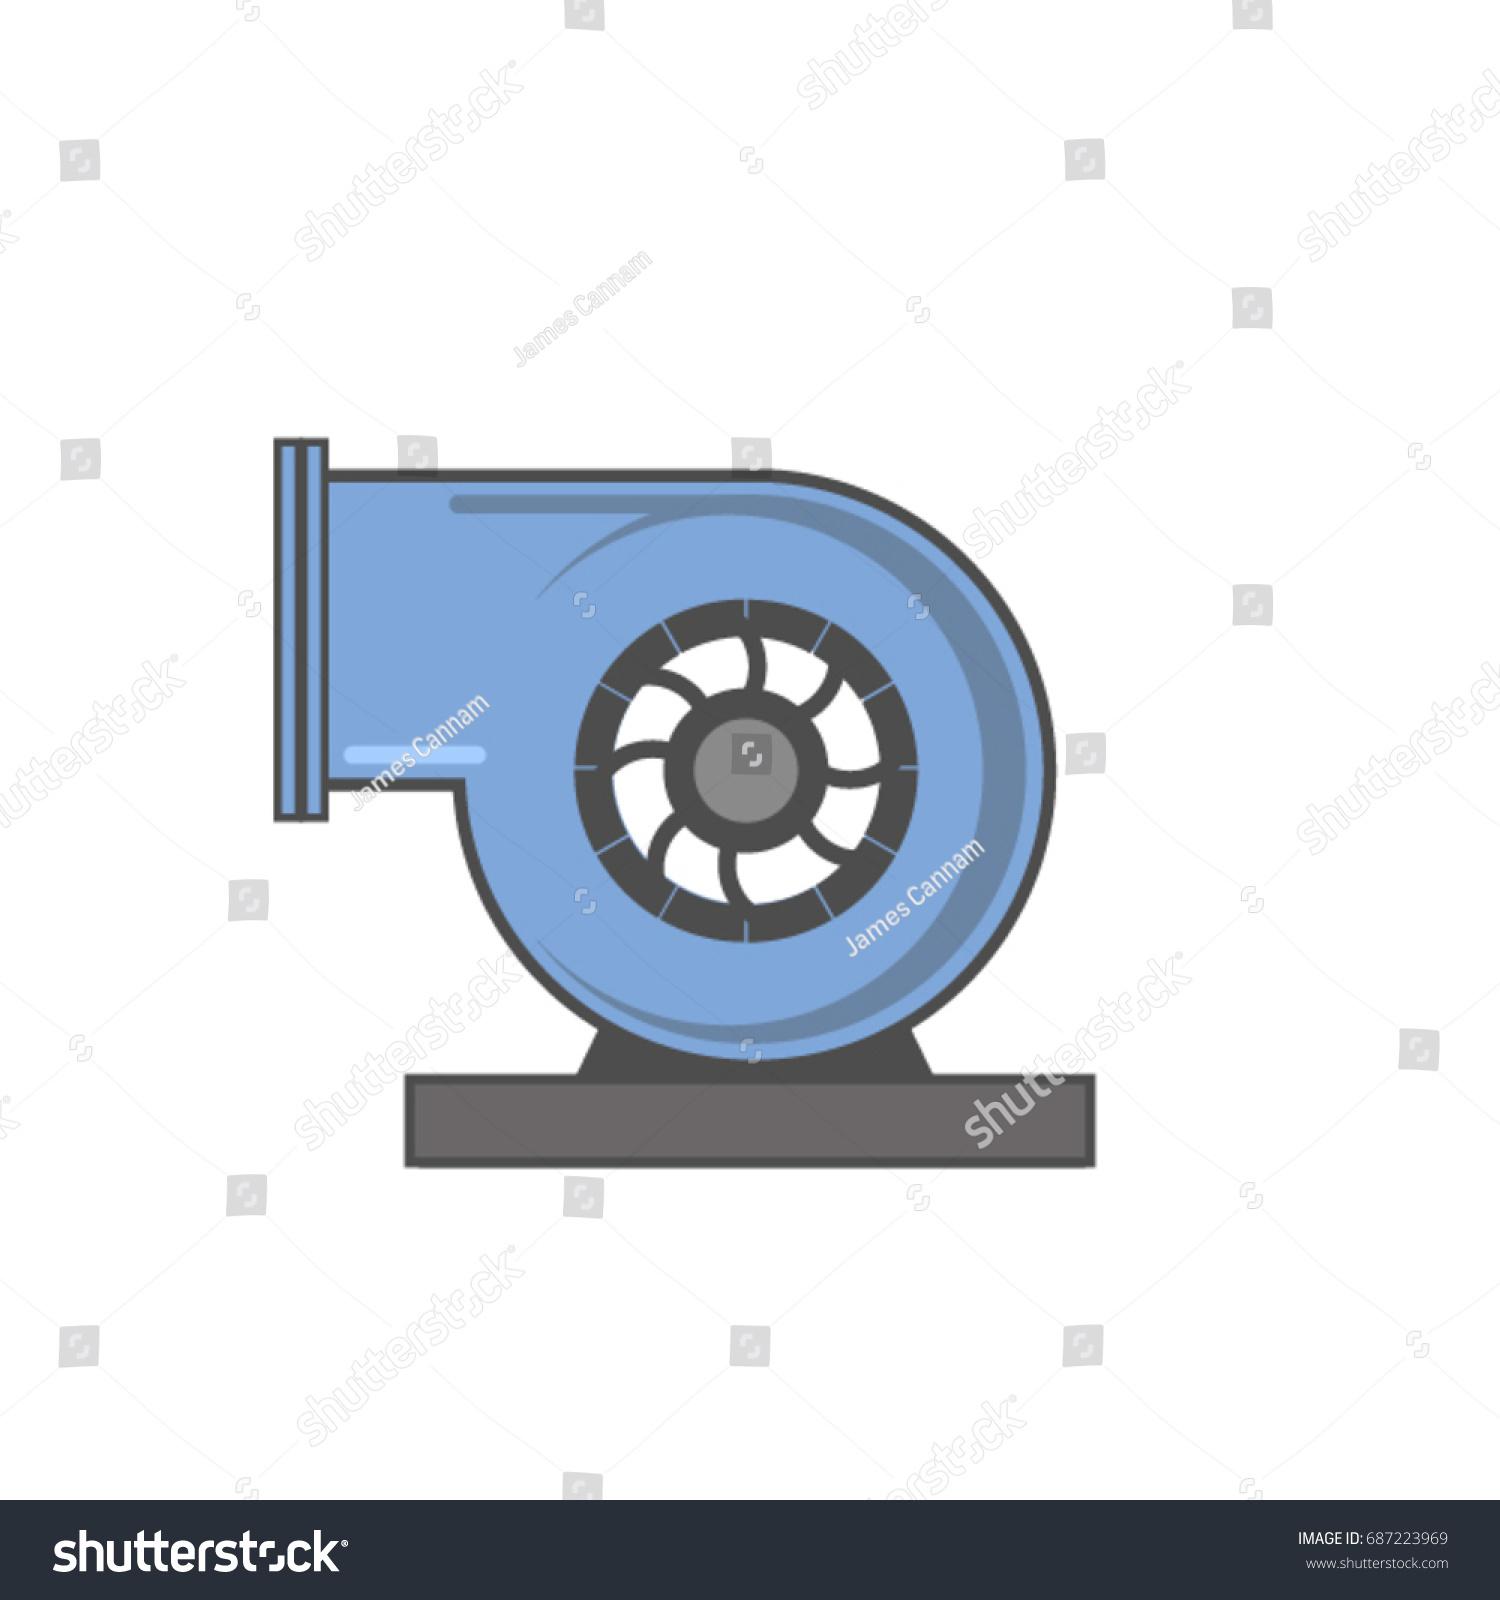 Centrifugal Fan Icon : Centrifugal fan stock vector shutterstock